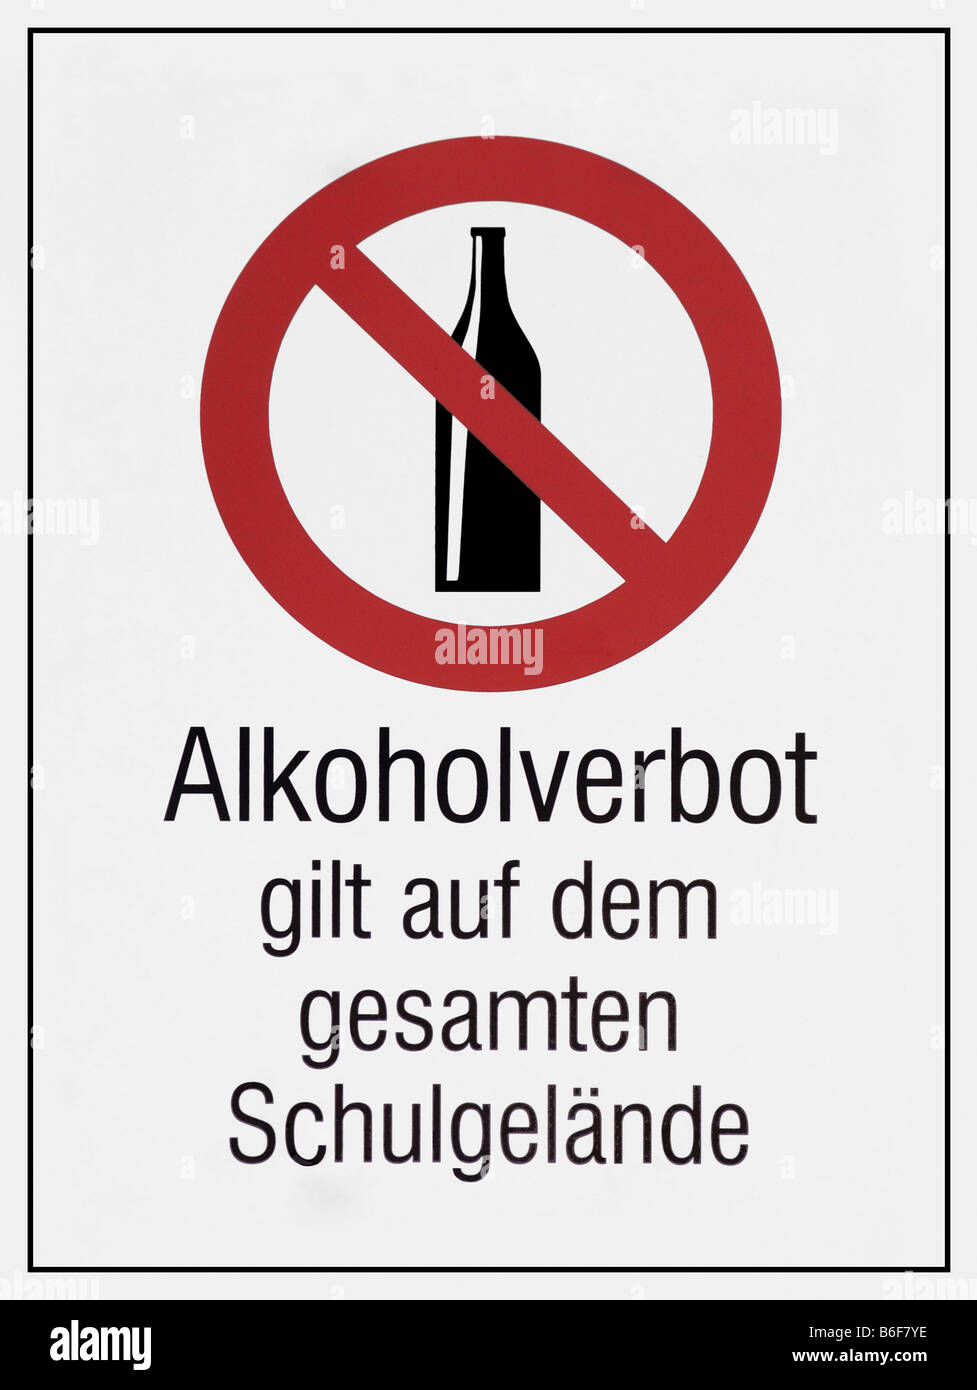 Sign, Alkoholverbot gilt auf dem gesamten Schulgelaende, alcohol ban in force on the entire school property - Stock Image